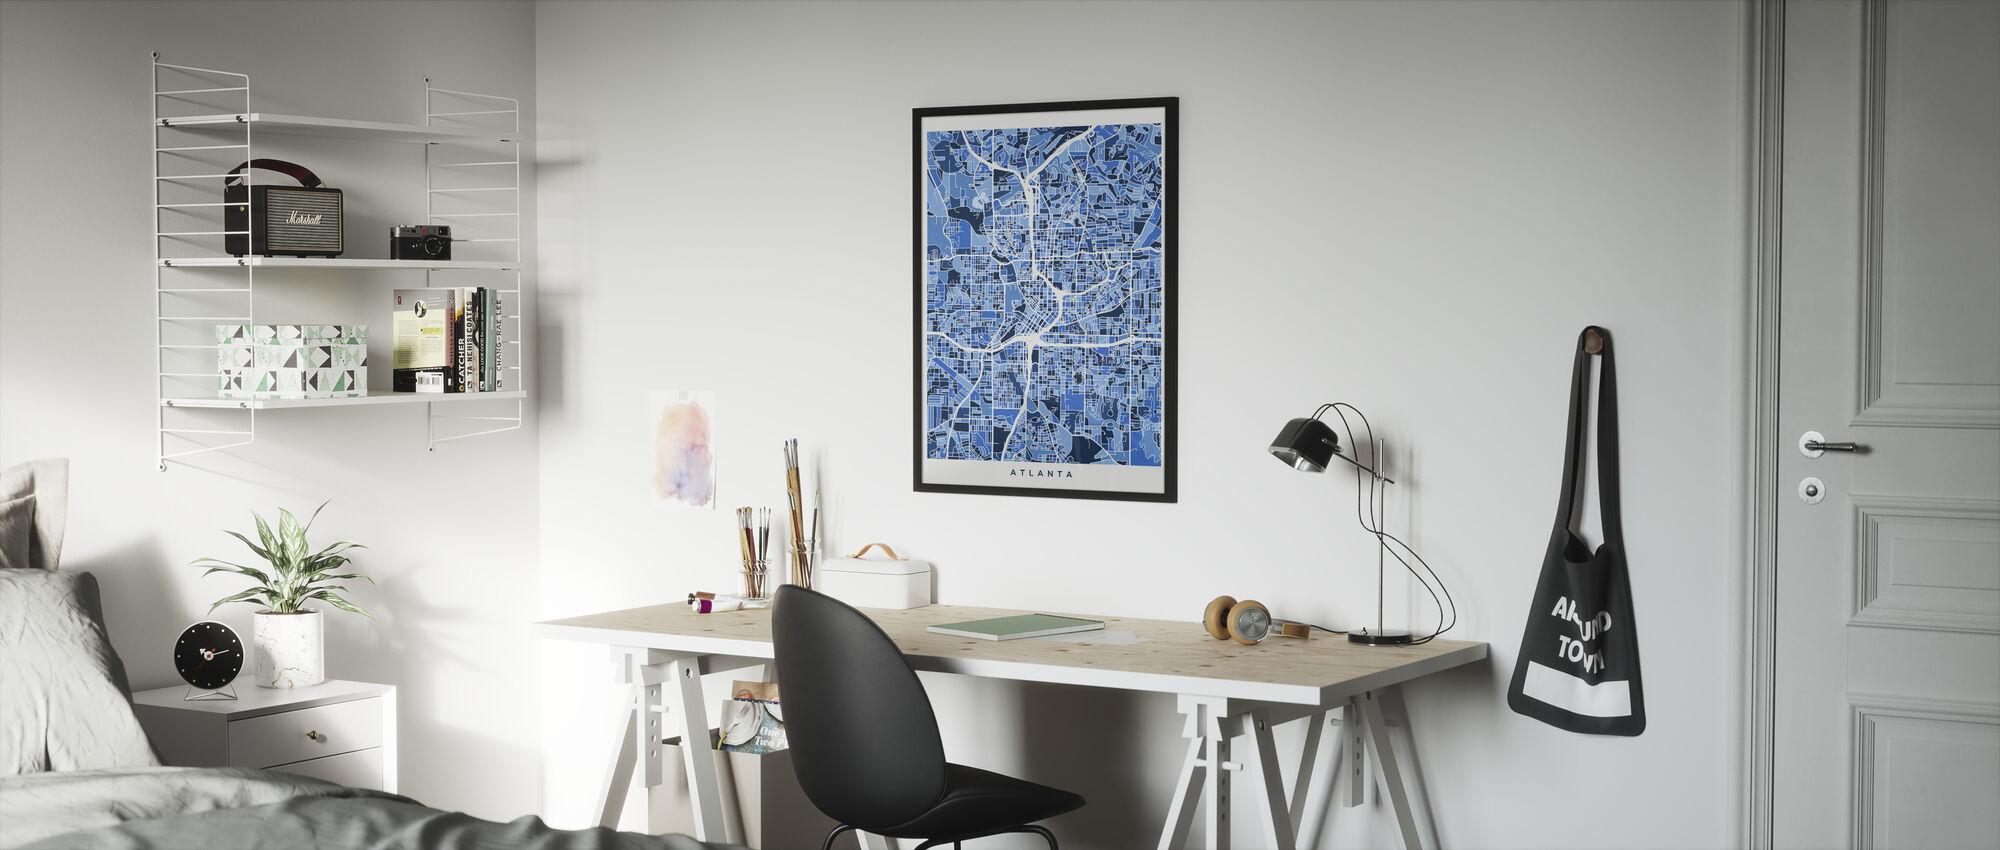 Atlanta Georgia City Map - Framed print - Kids Room